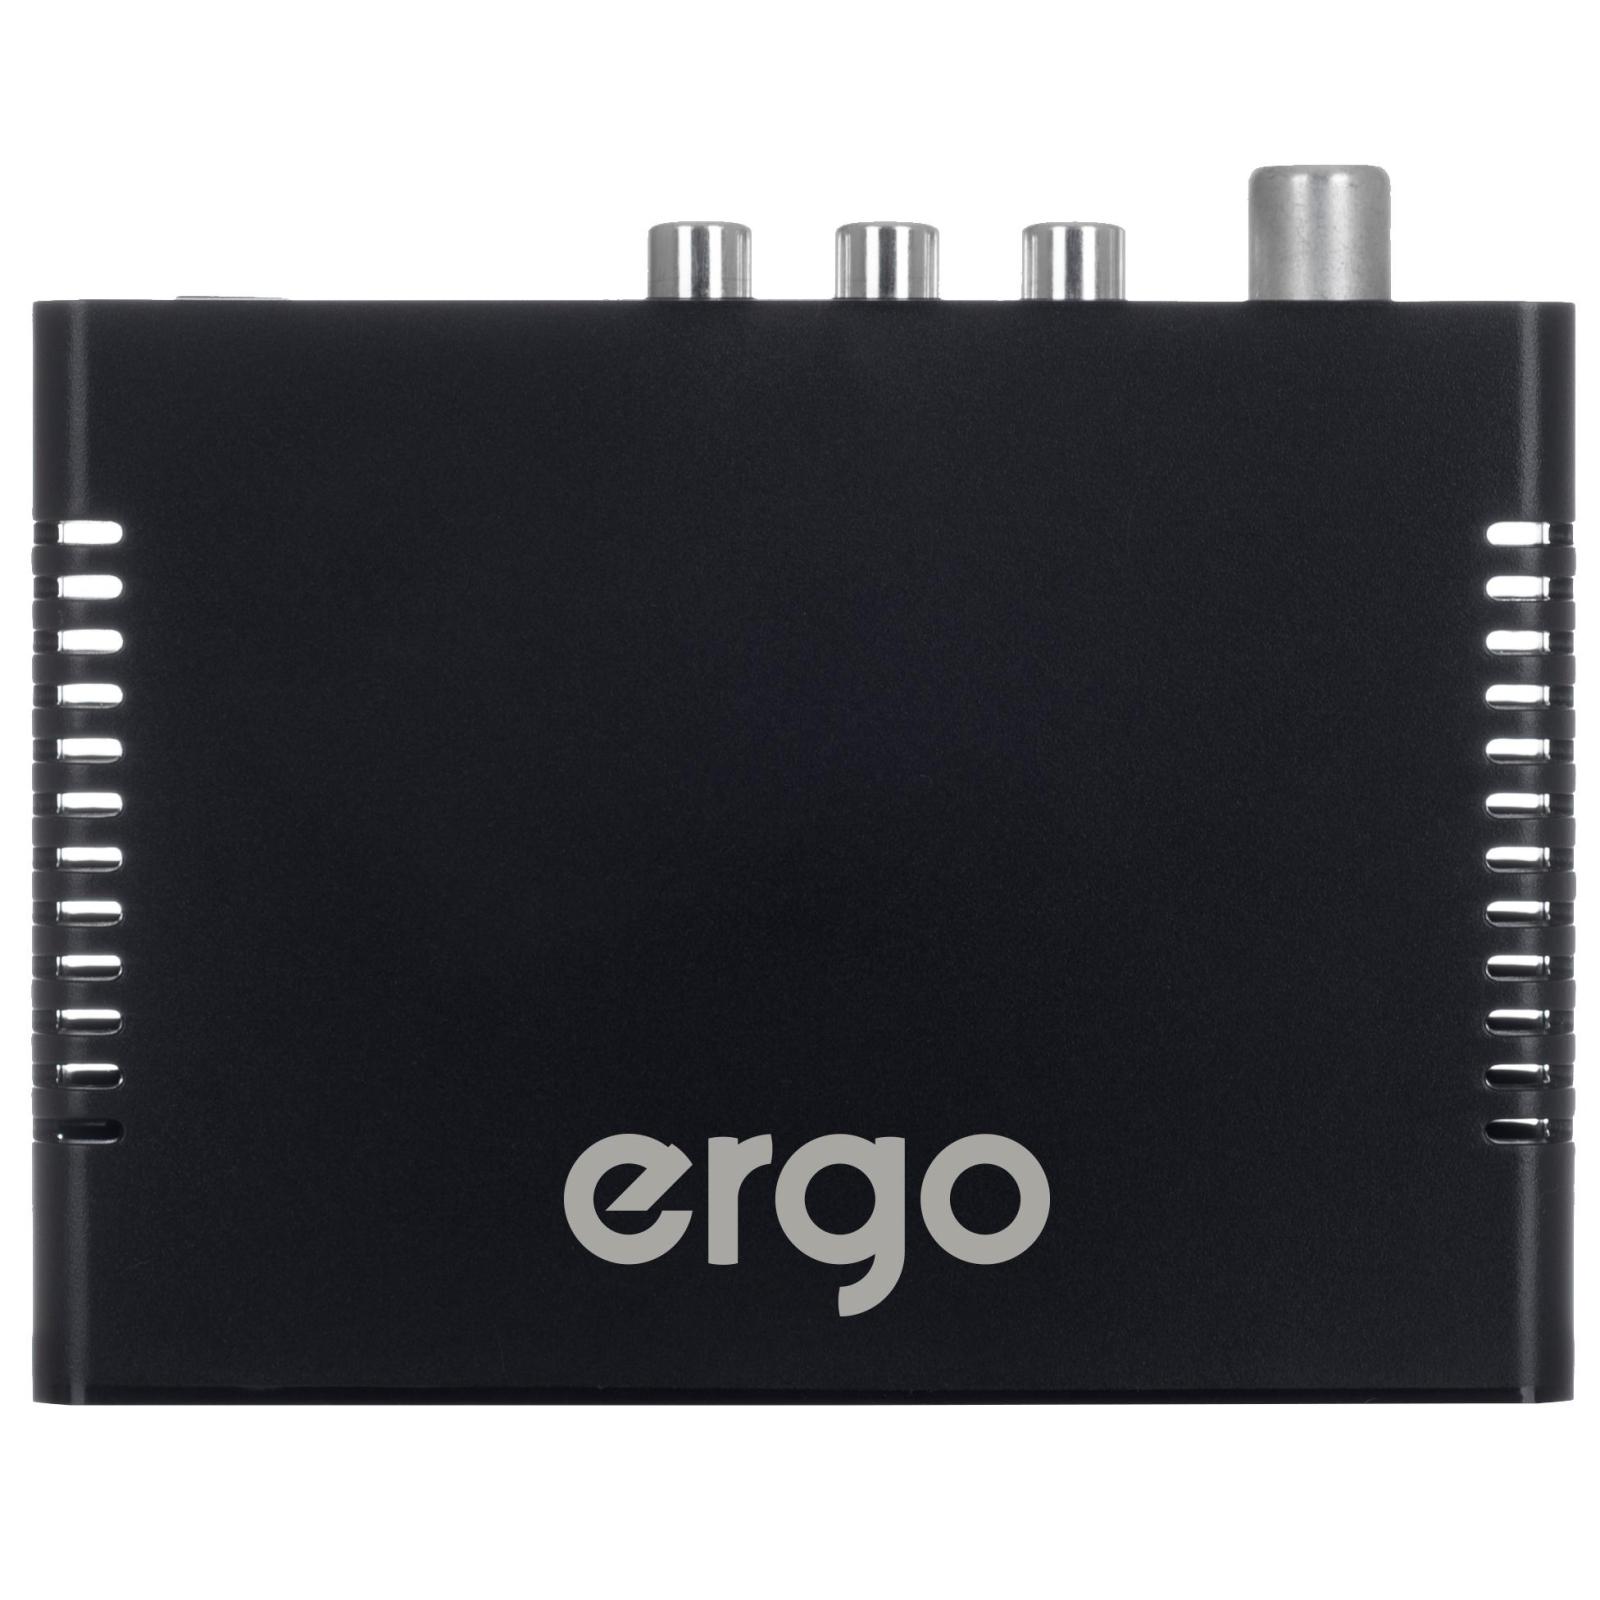 ТВ тюнер Ergo 1108 (DVB-T, DVB-T2) (STB-1108) зображення 2